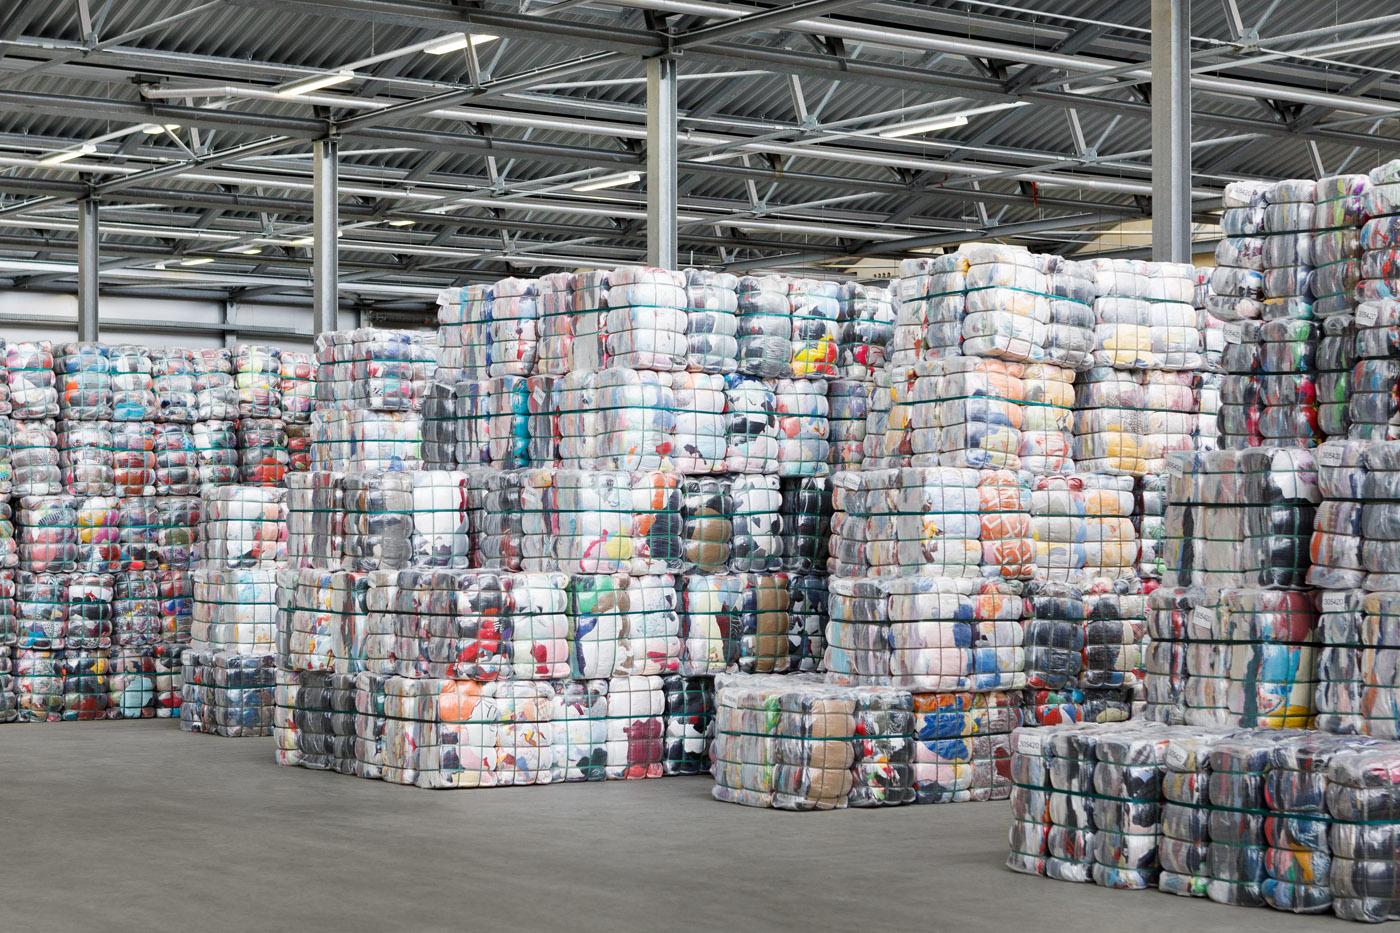 soex textilrecycling Lagerhalle Stoffballen